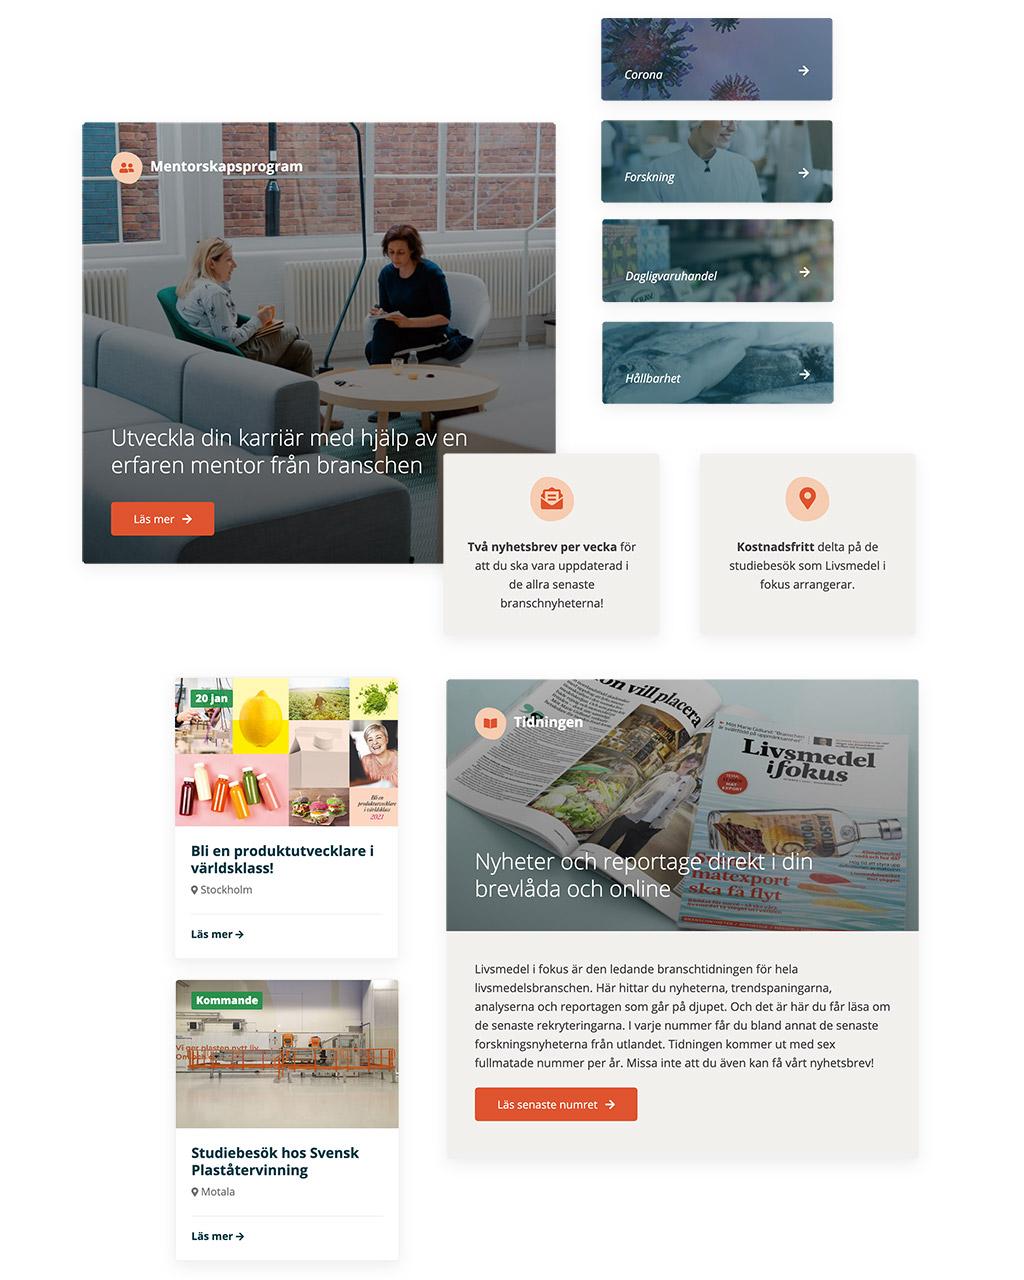 Livsmedel i fokus webbdesign